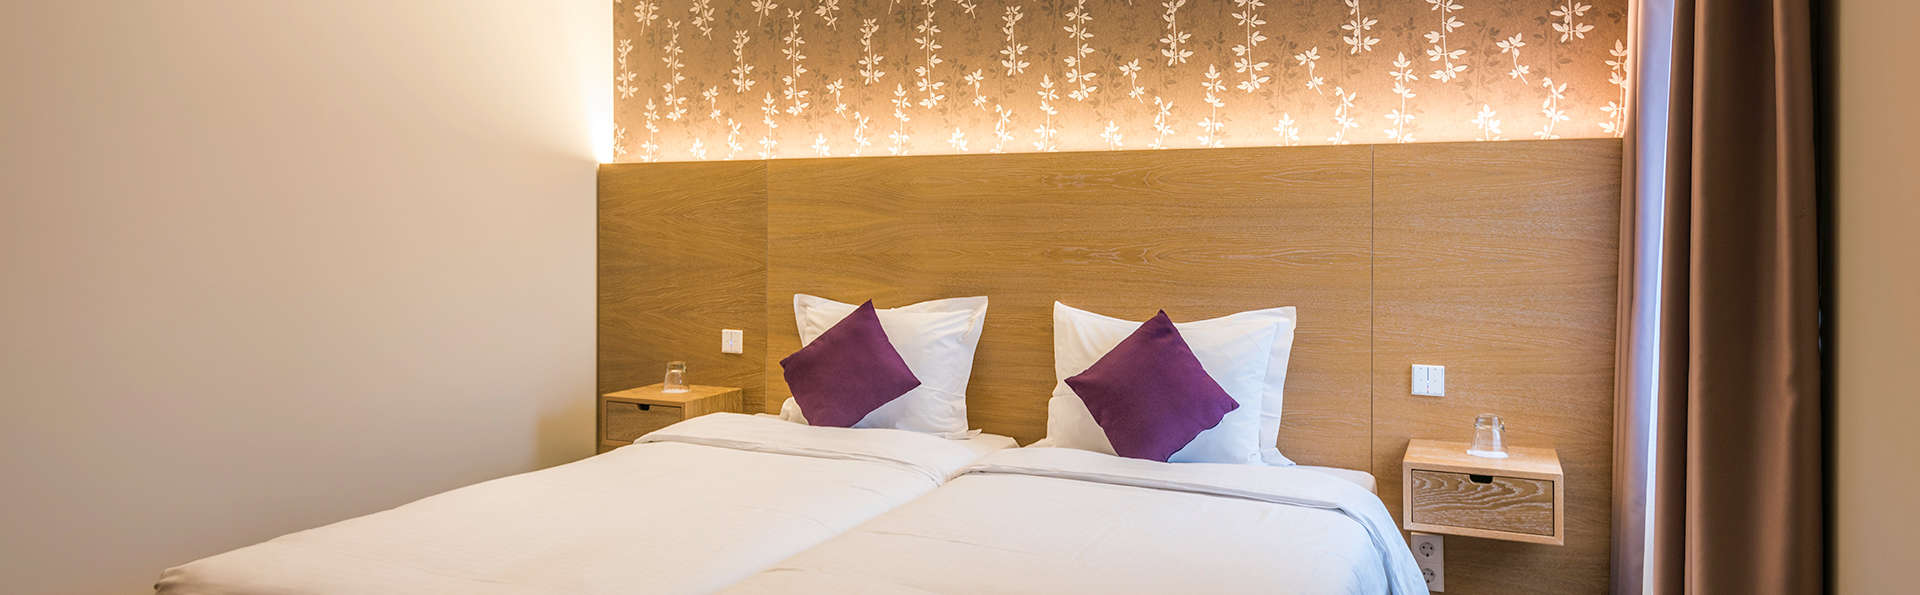 Hotel Le Bon Repos - Edit_Room11.jpg